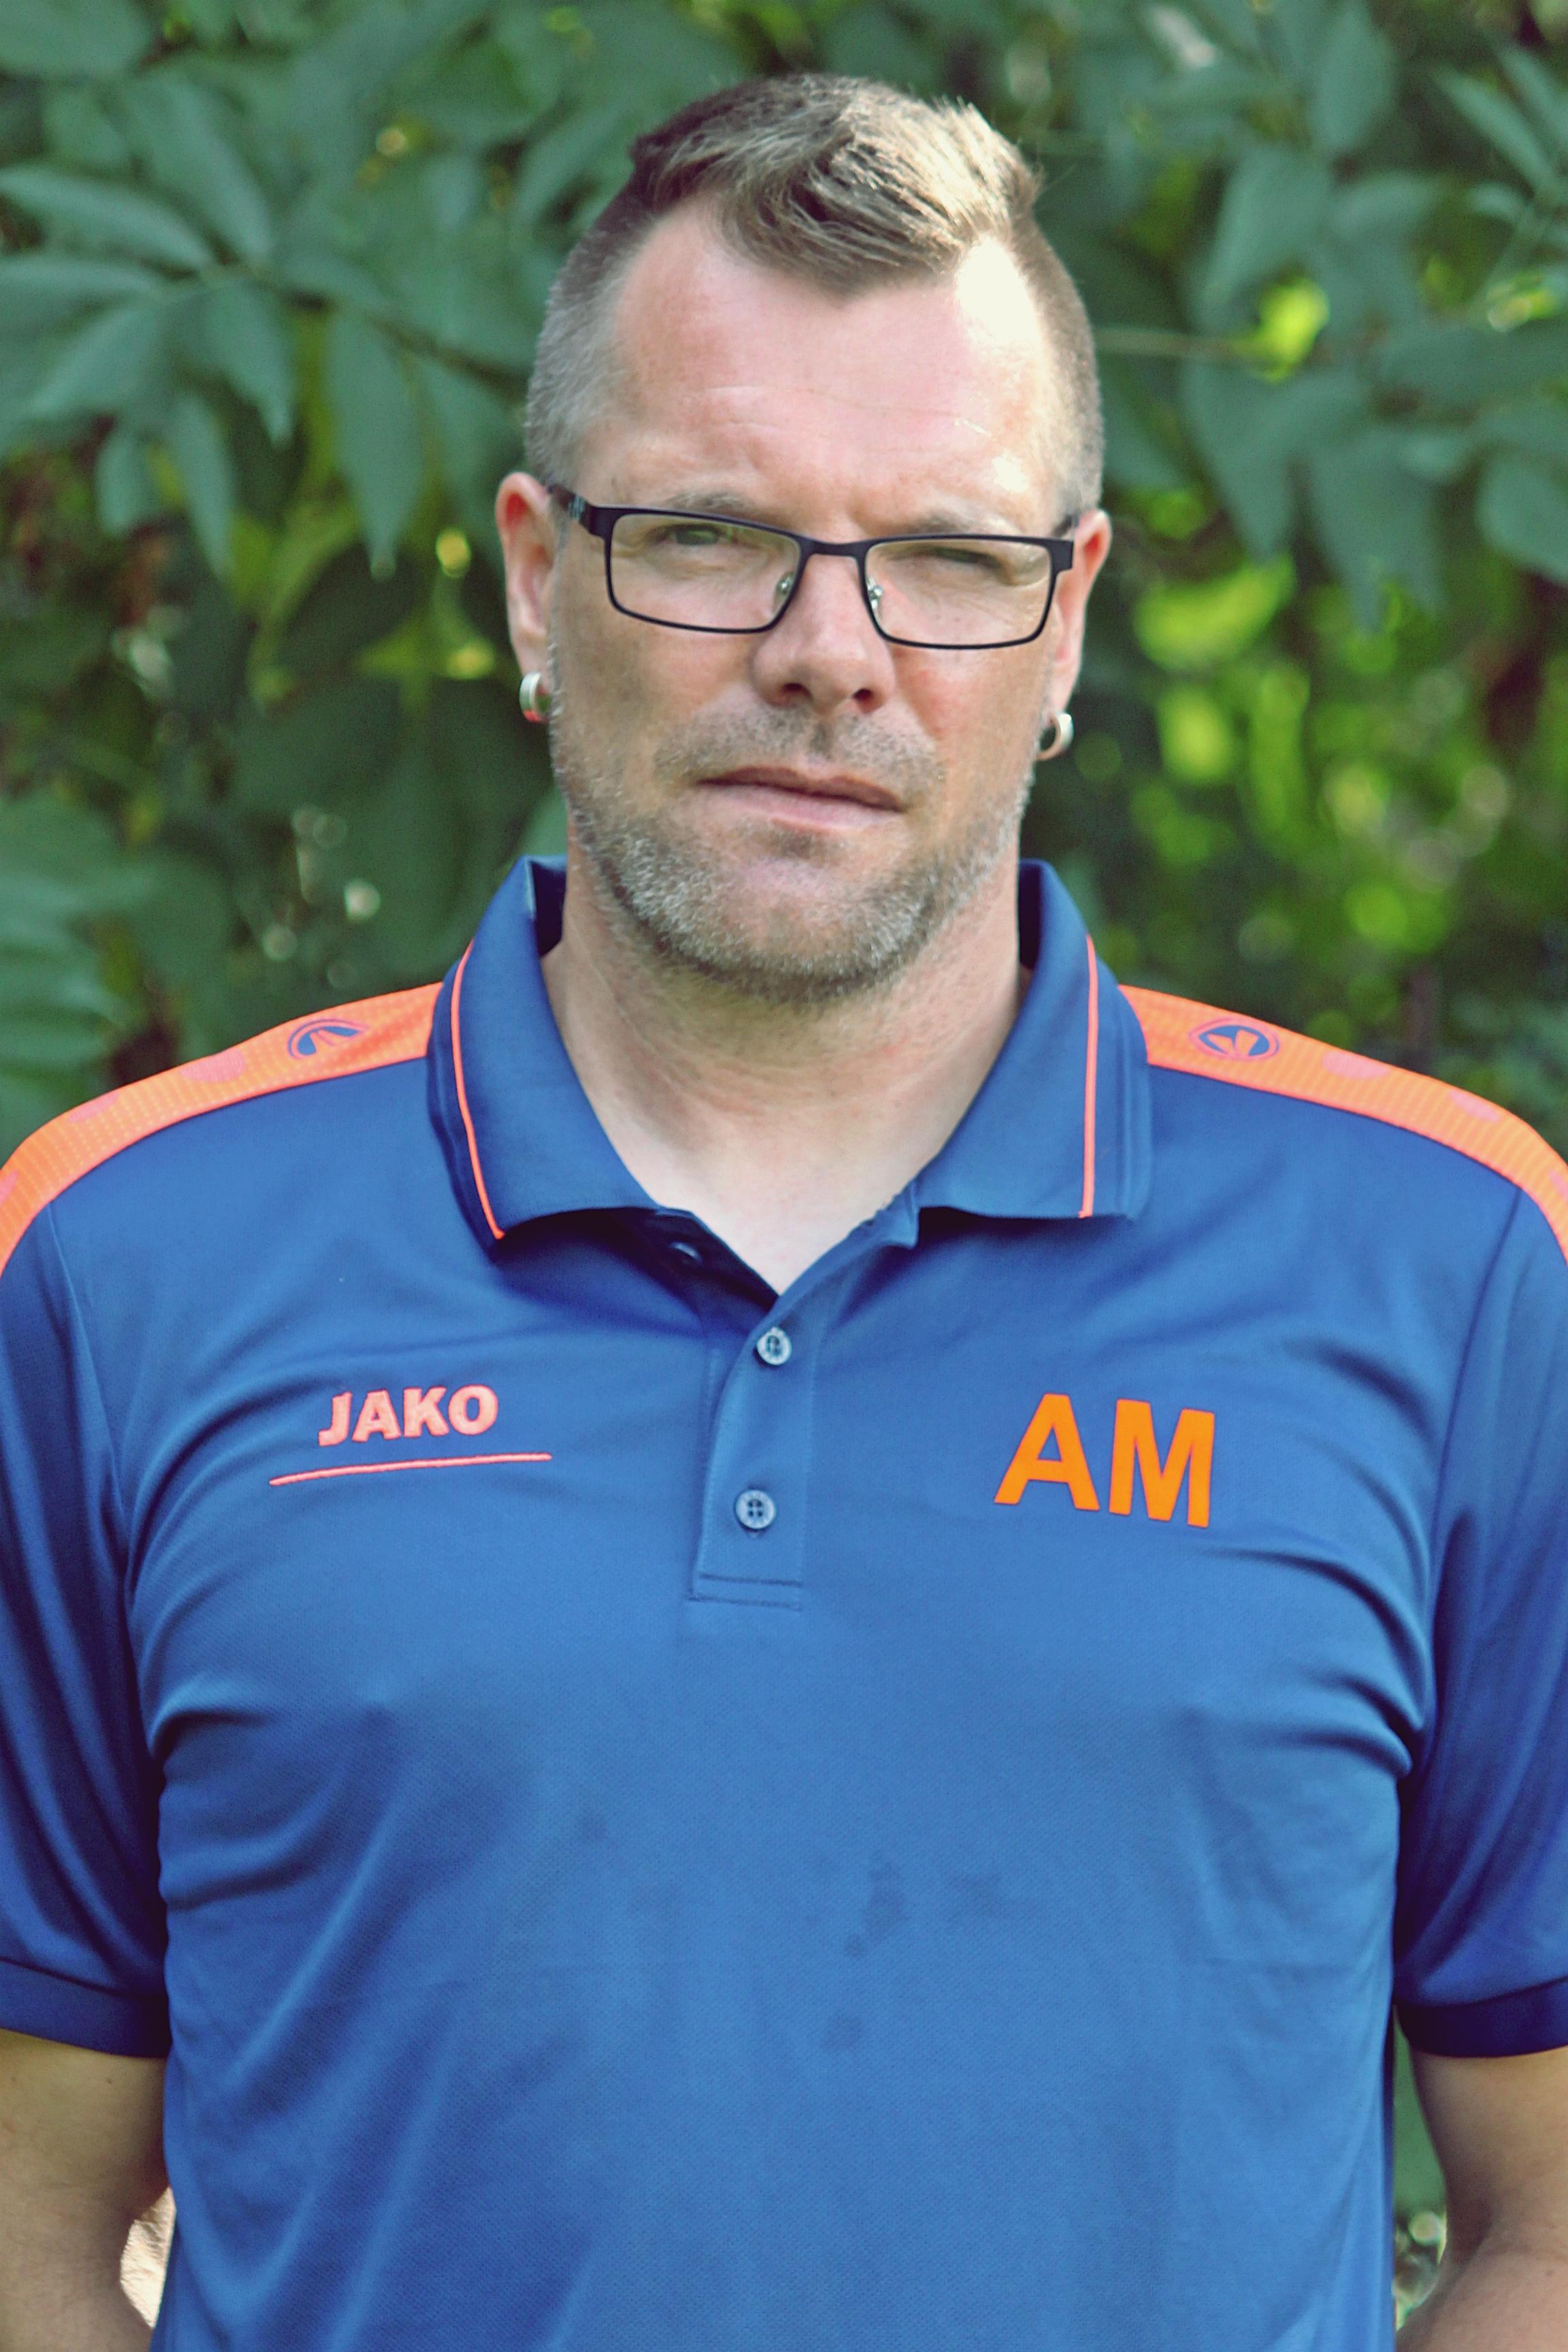 Andreas Moscarda